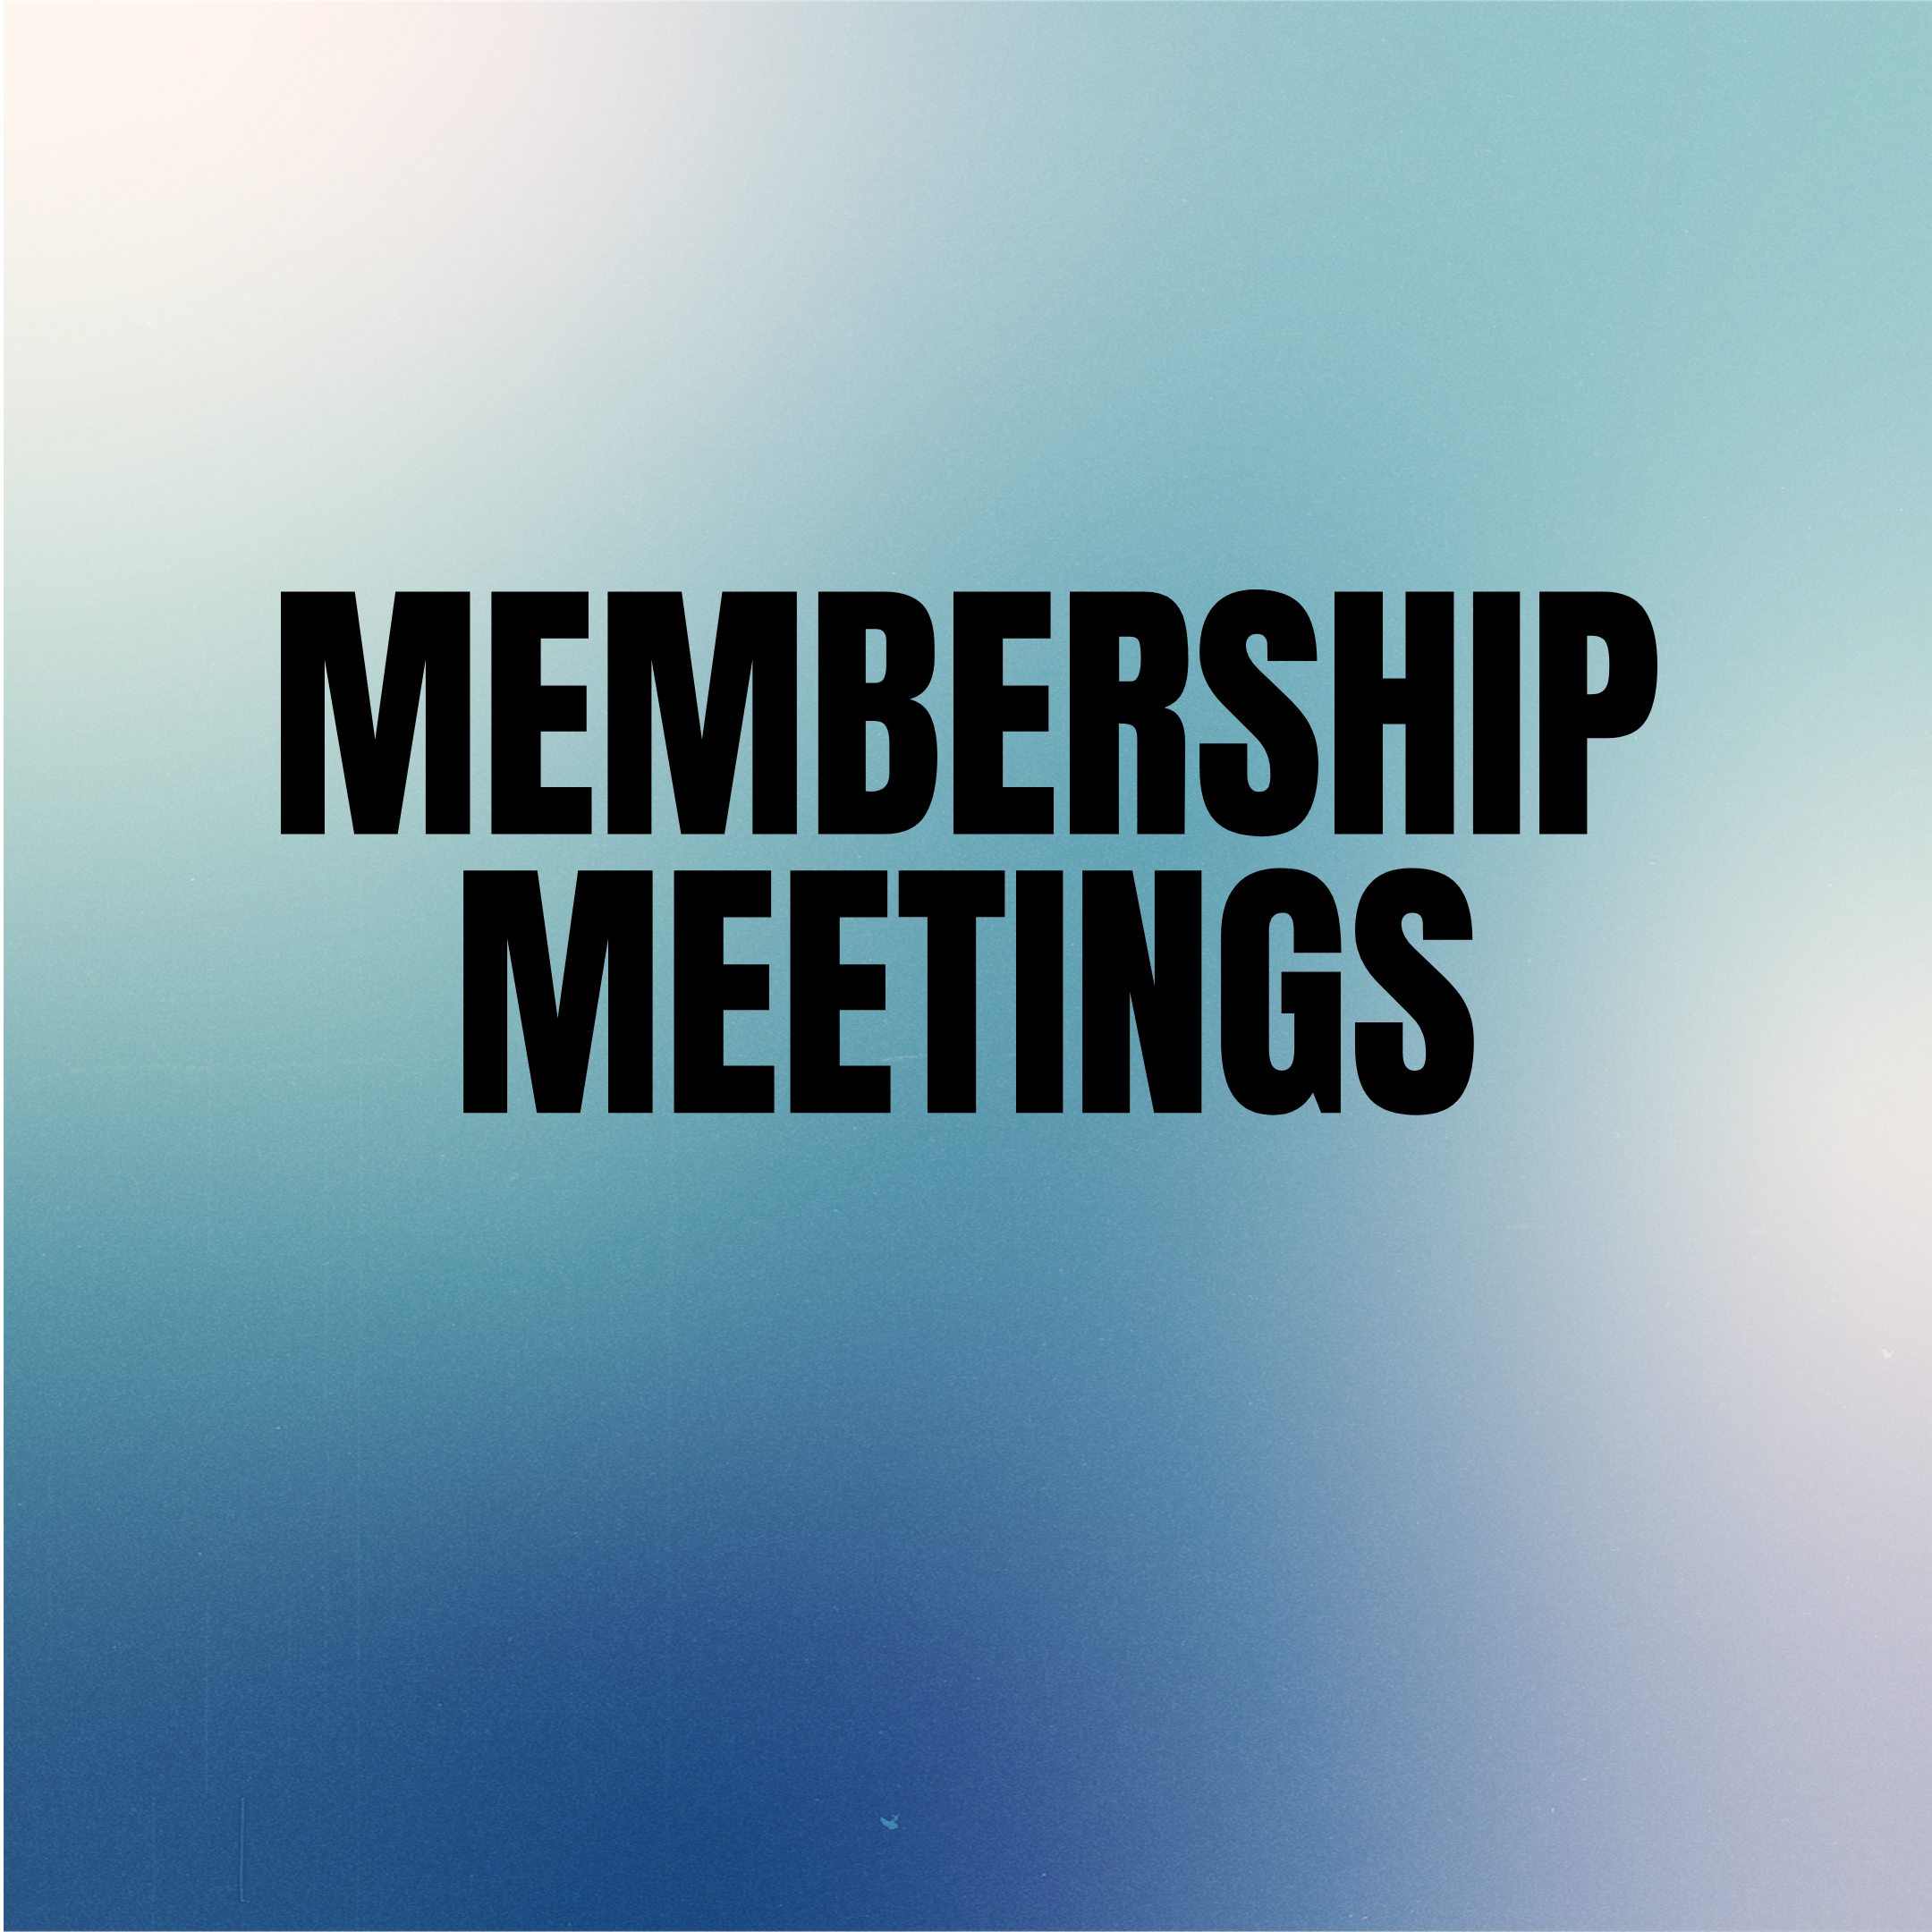 Membership Meetings